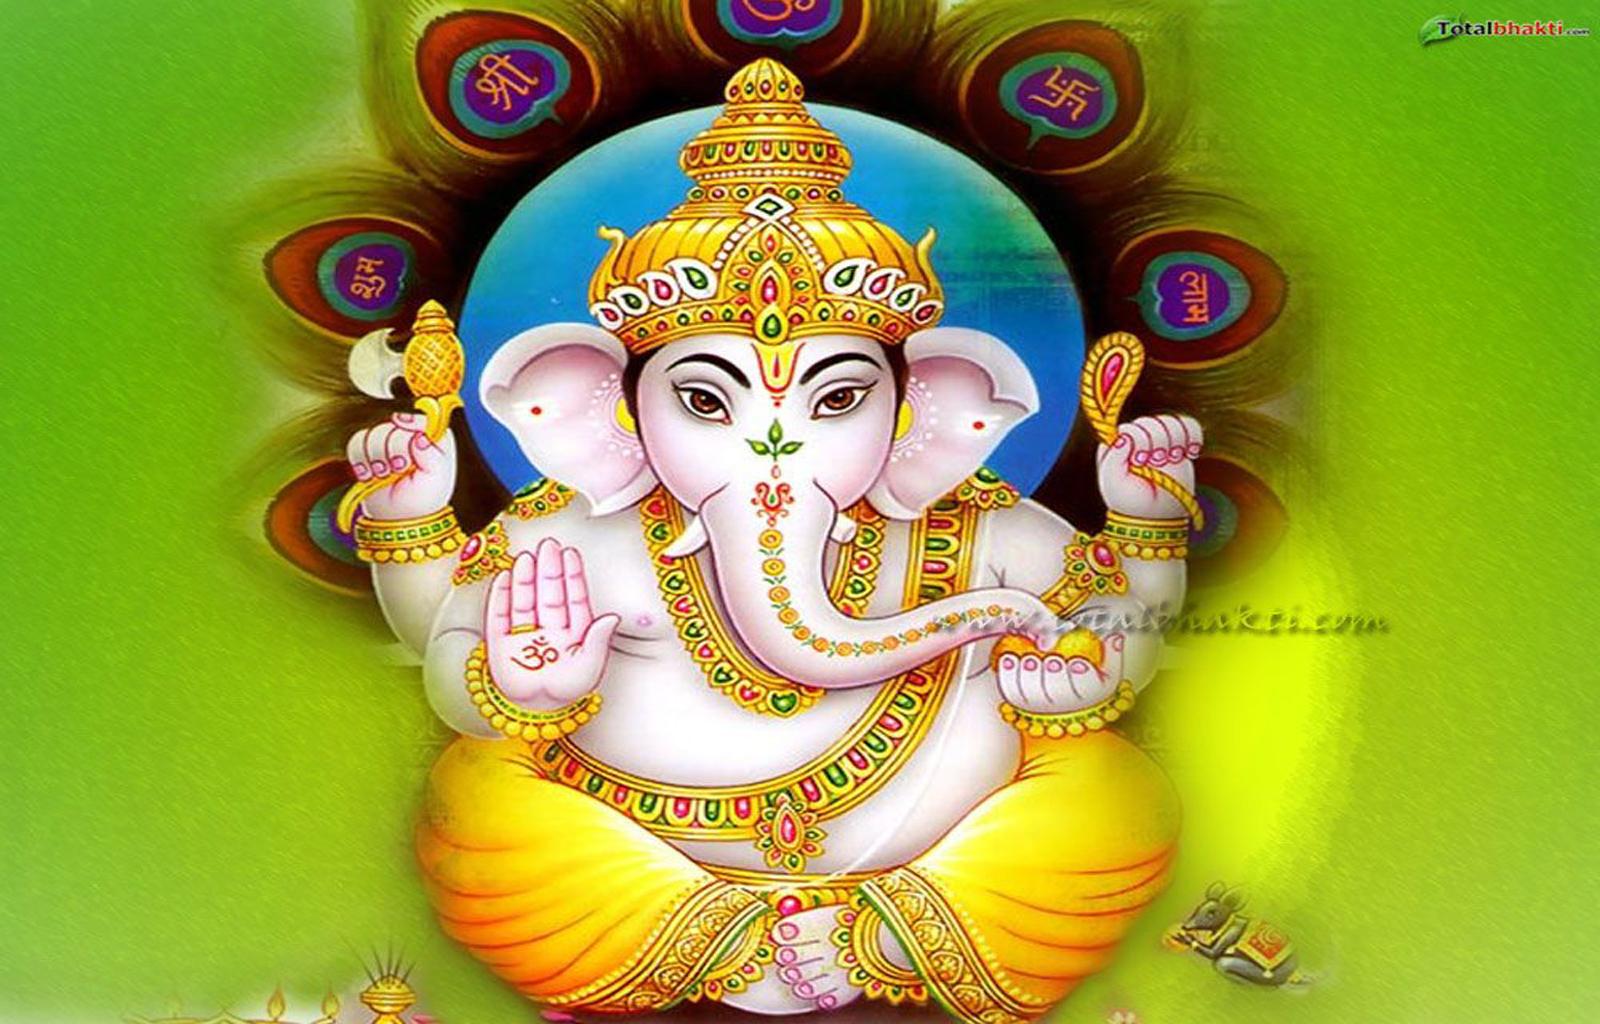 ganesha hindu god - photo #25